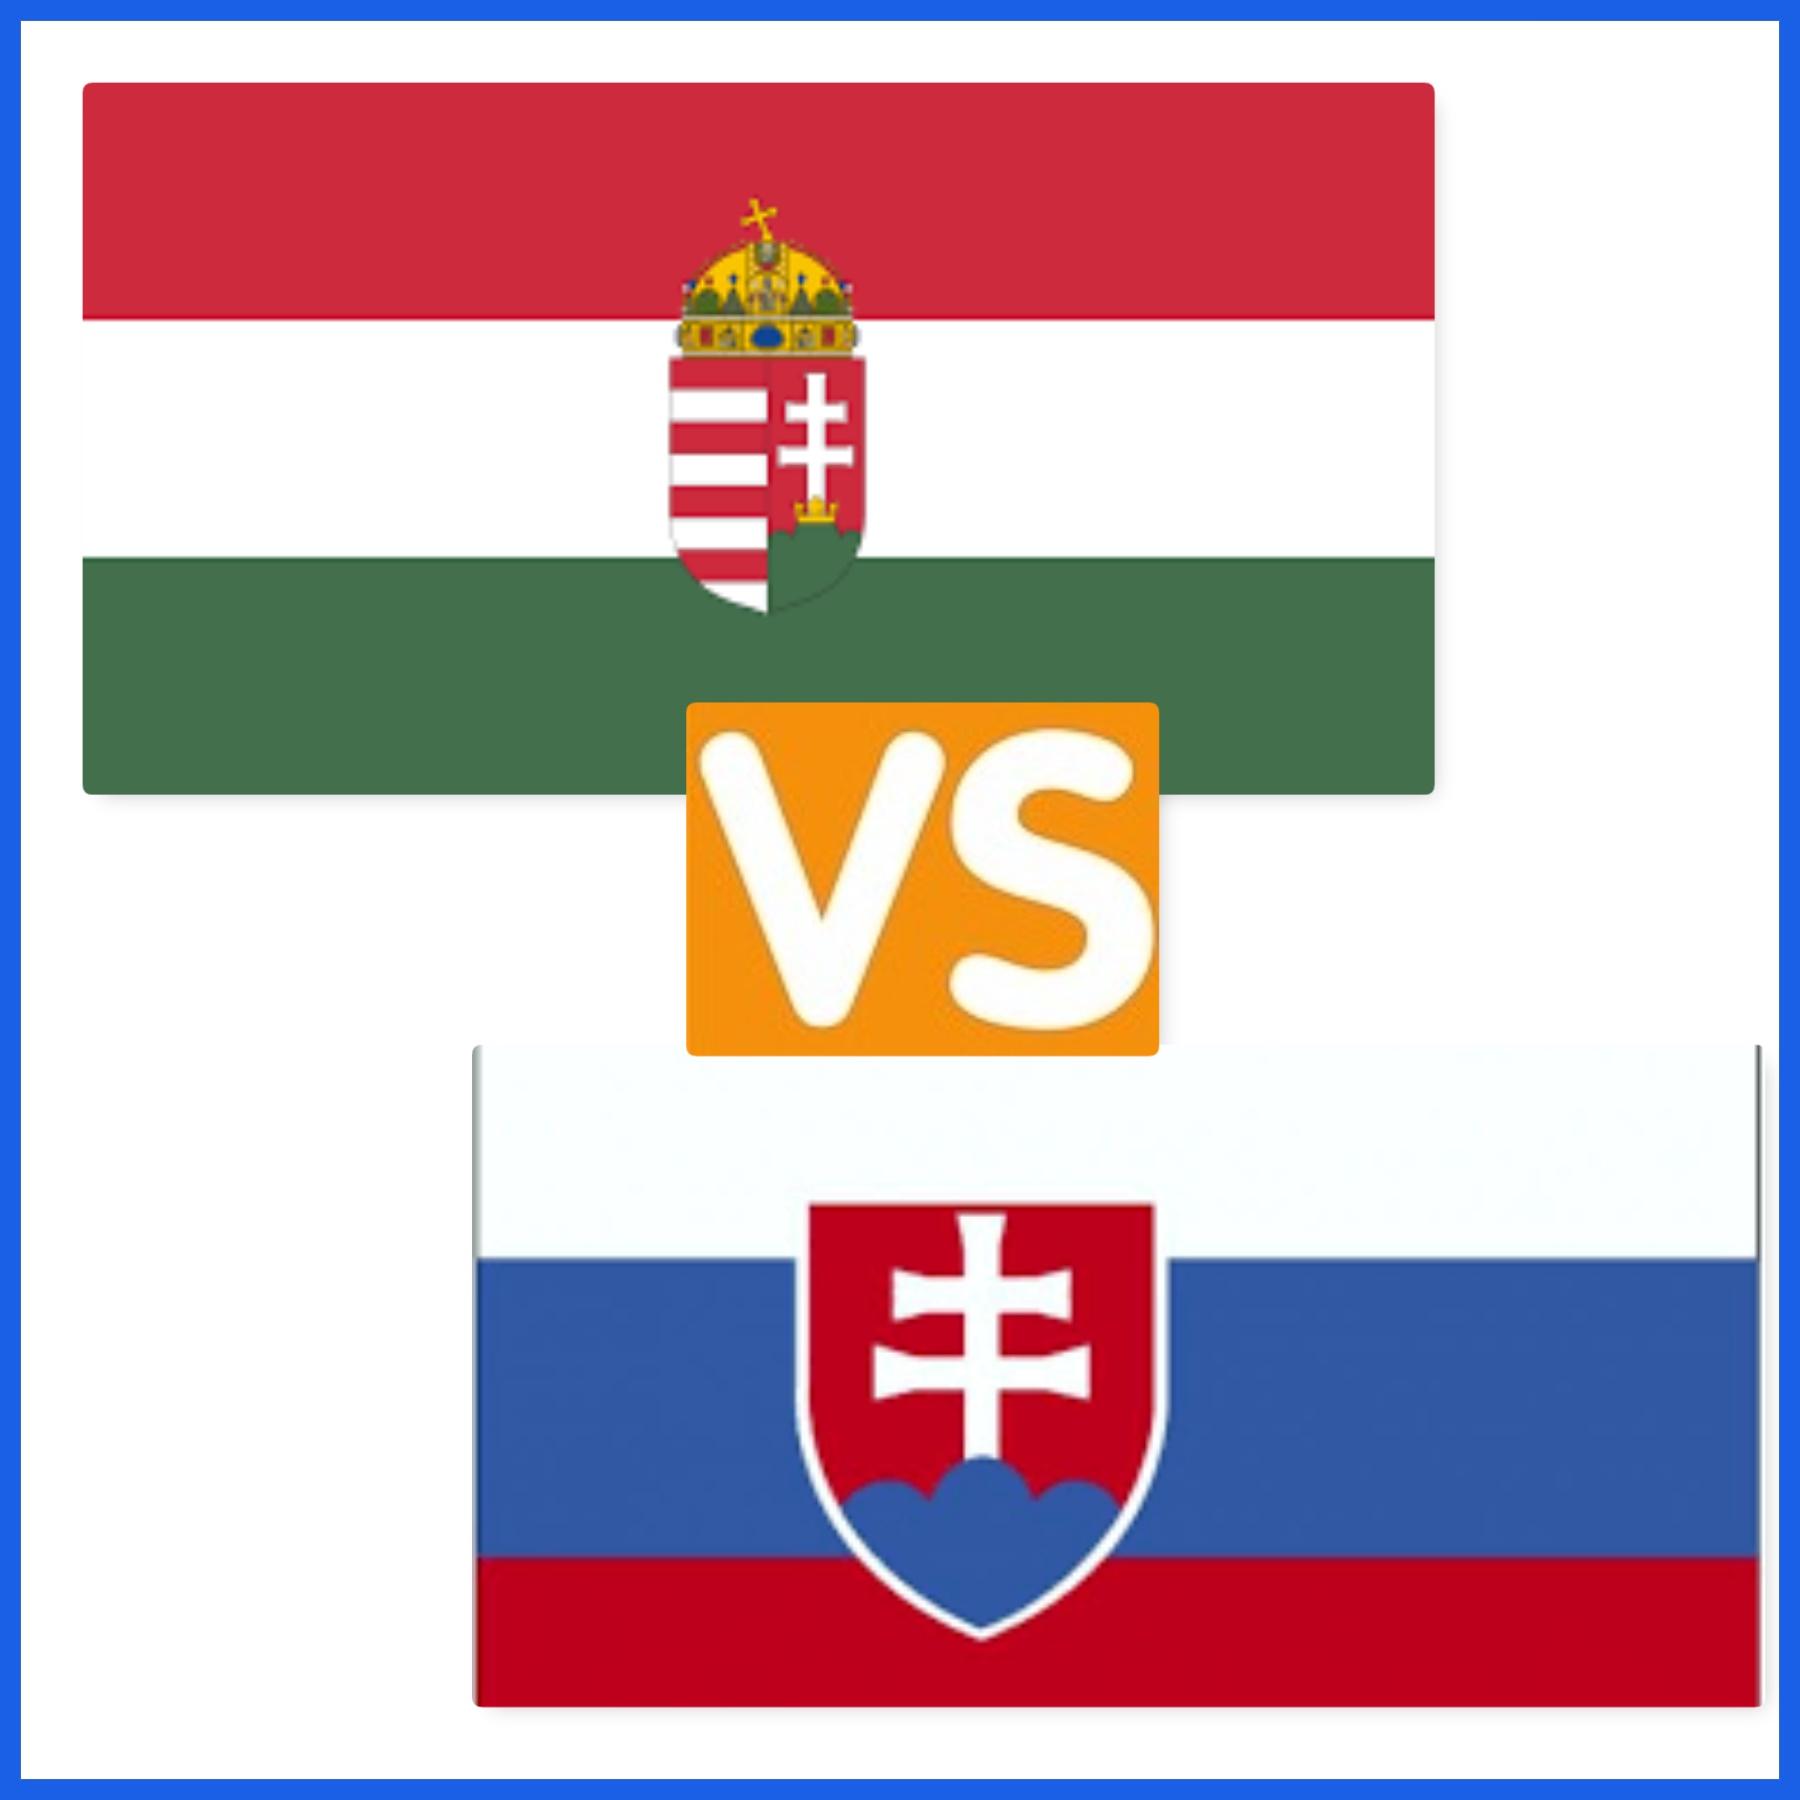 magyar_vs_szlovak.jpg